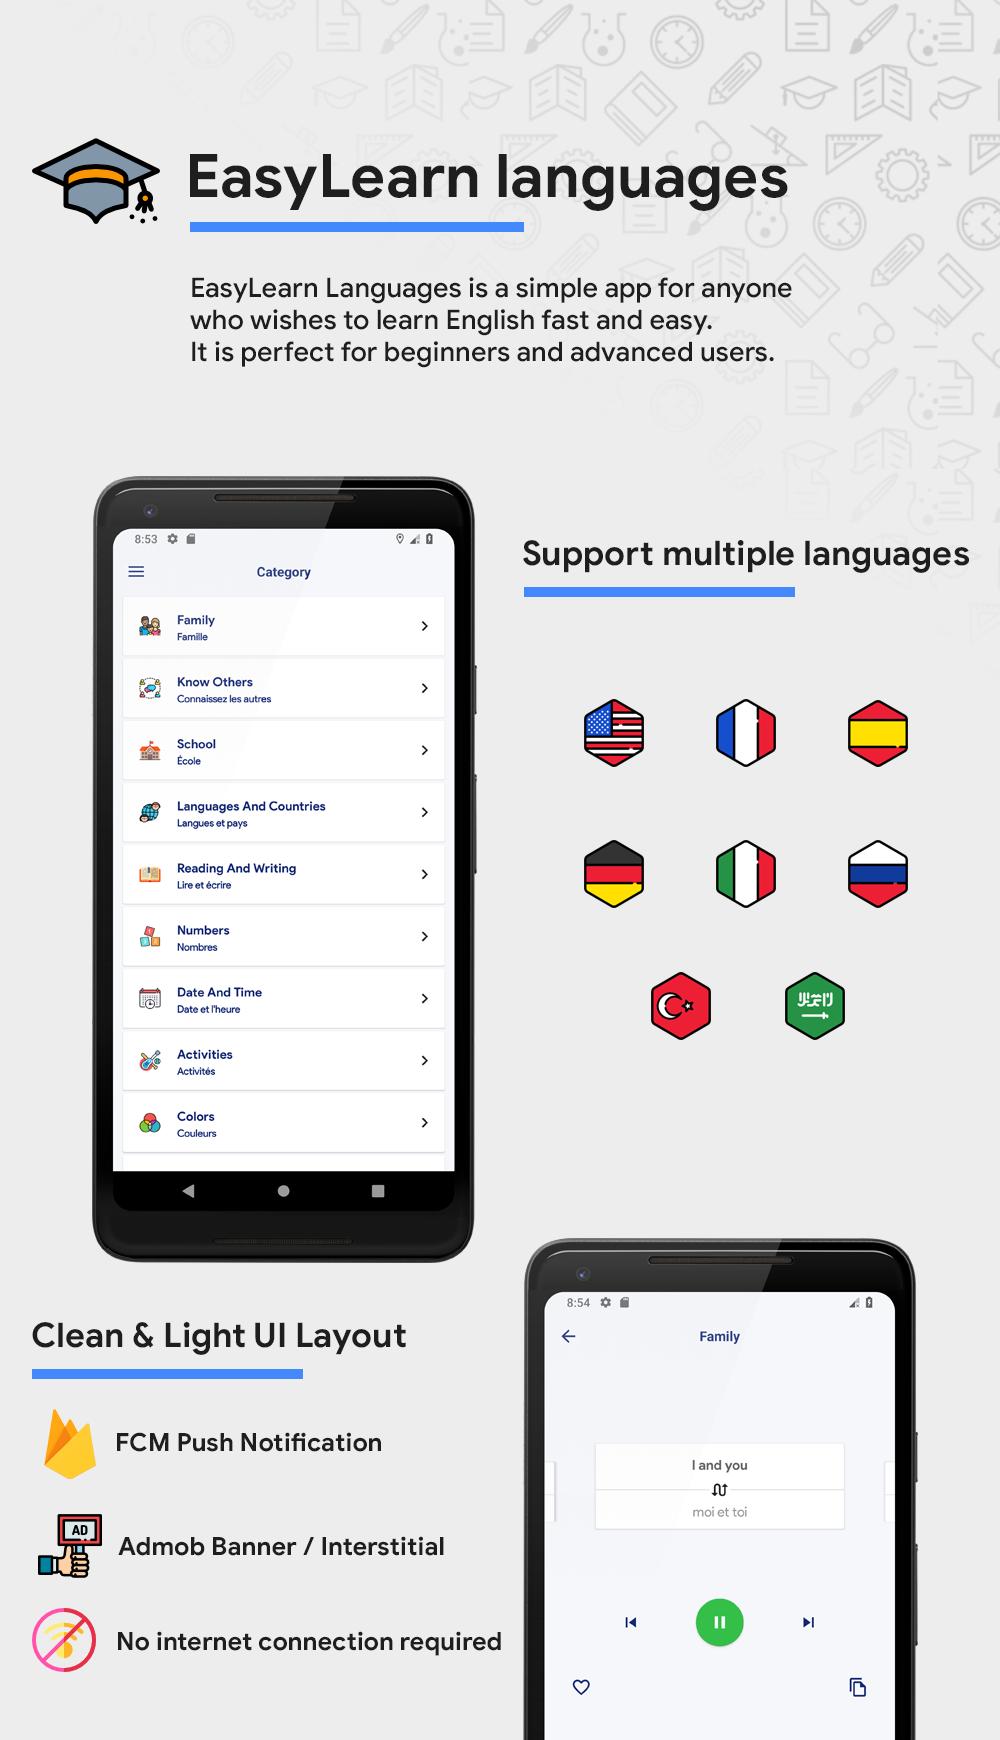 EasyLearn languages | AdMob | FCM Push Notification | Scripts